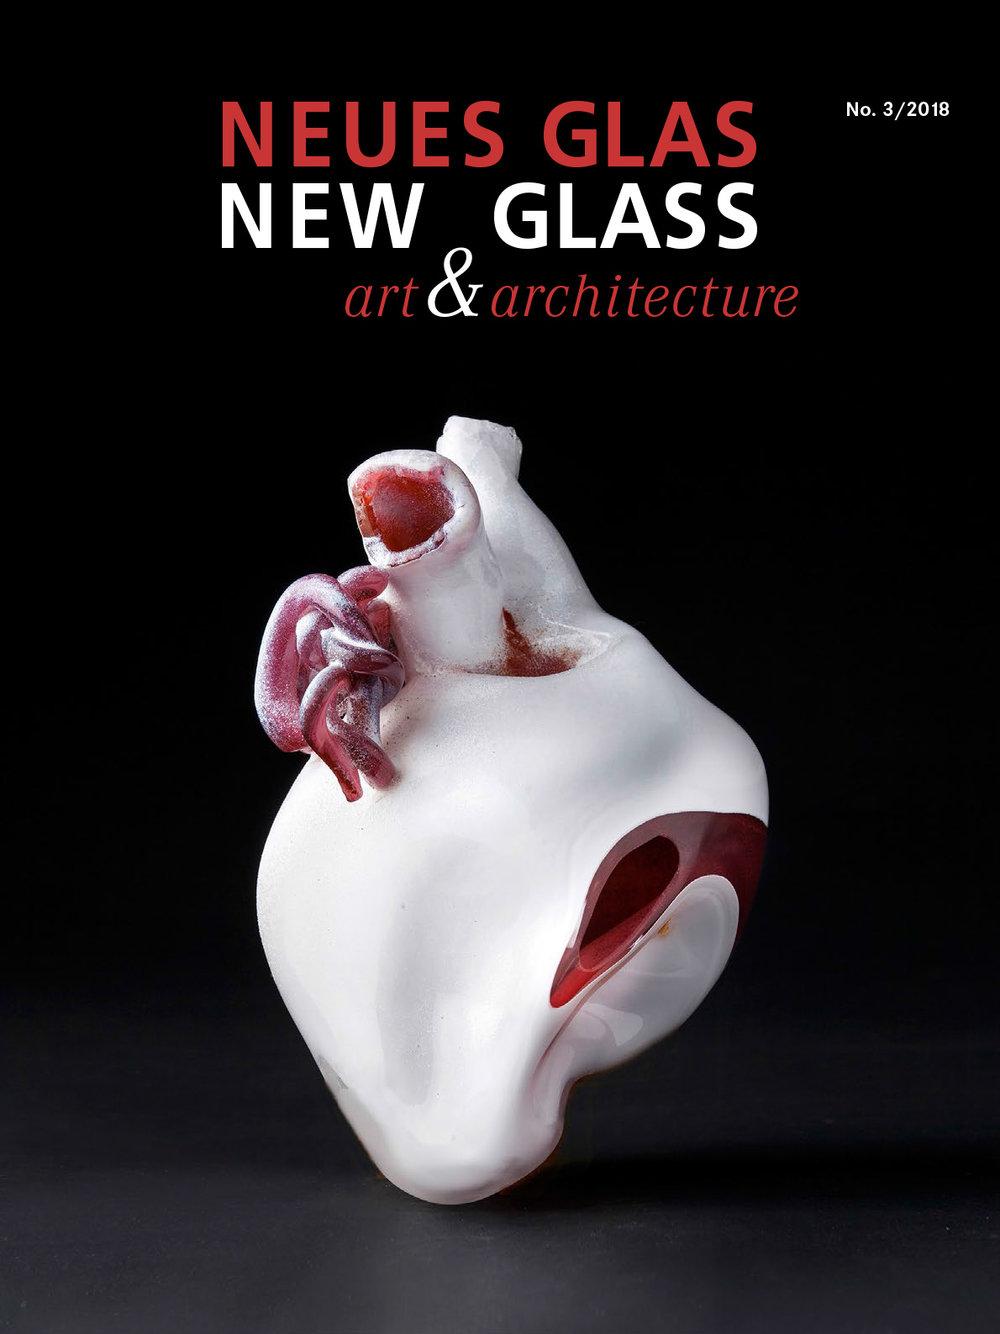 Neues Glas New Glass Art & Architecture 3/2018